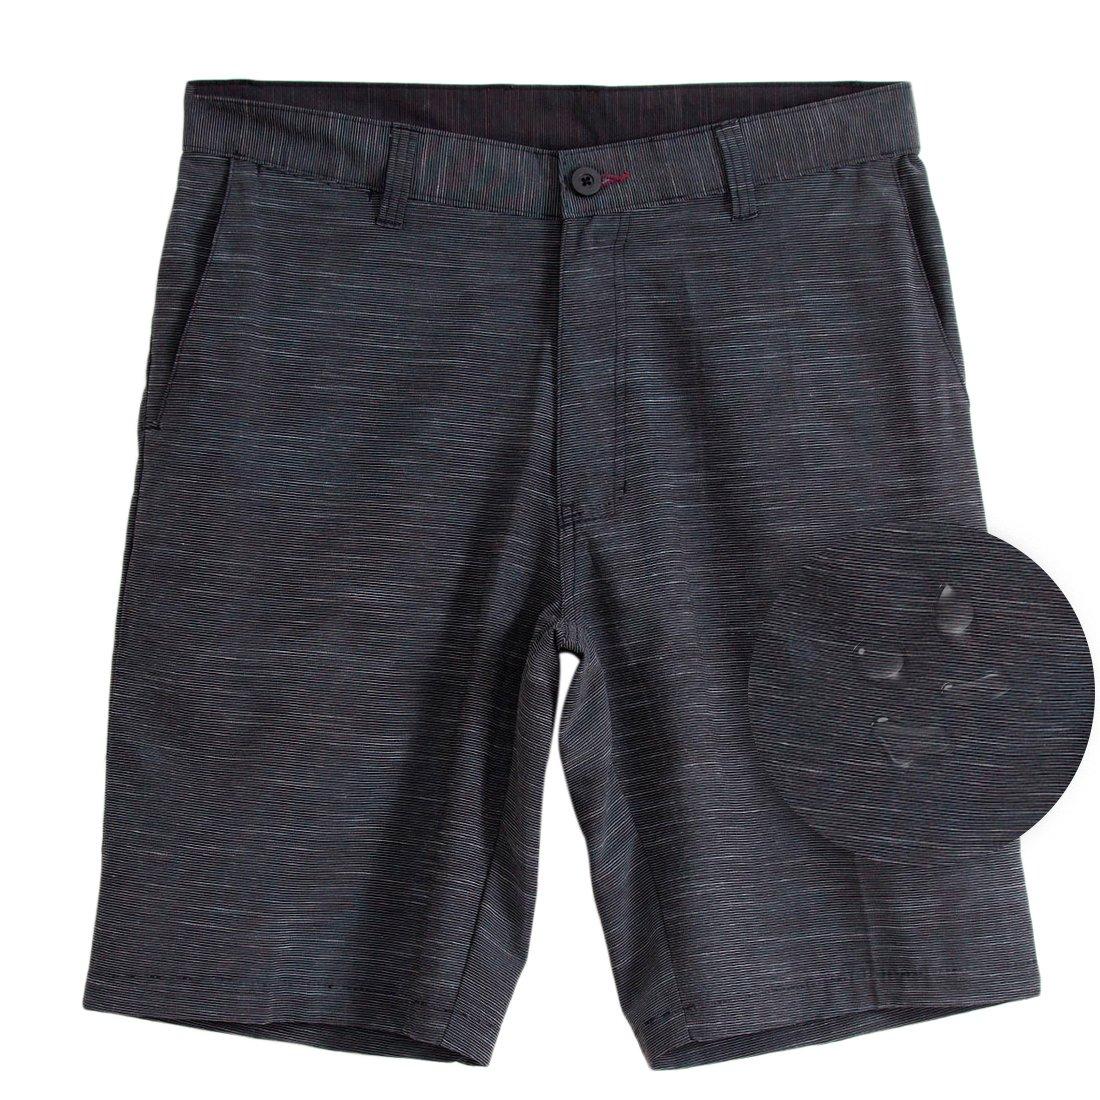 5e647b5c27 Top1: Burnside Mens Quick Dry Stretch Hybrid Dual Function Lightweight  Shorts